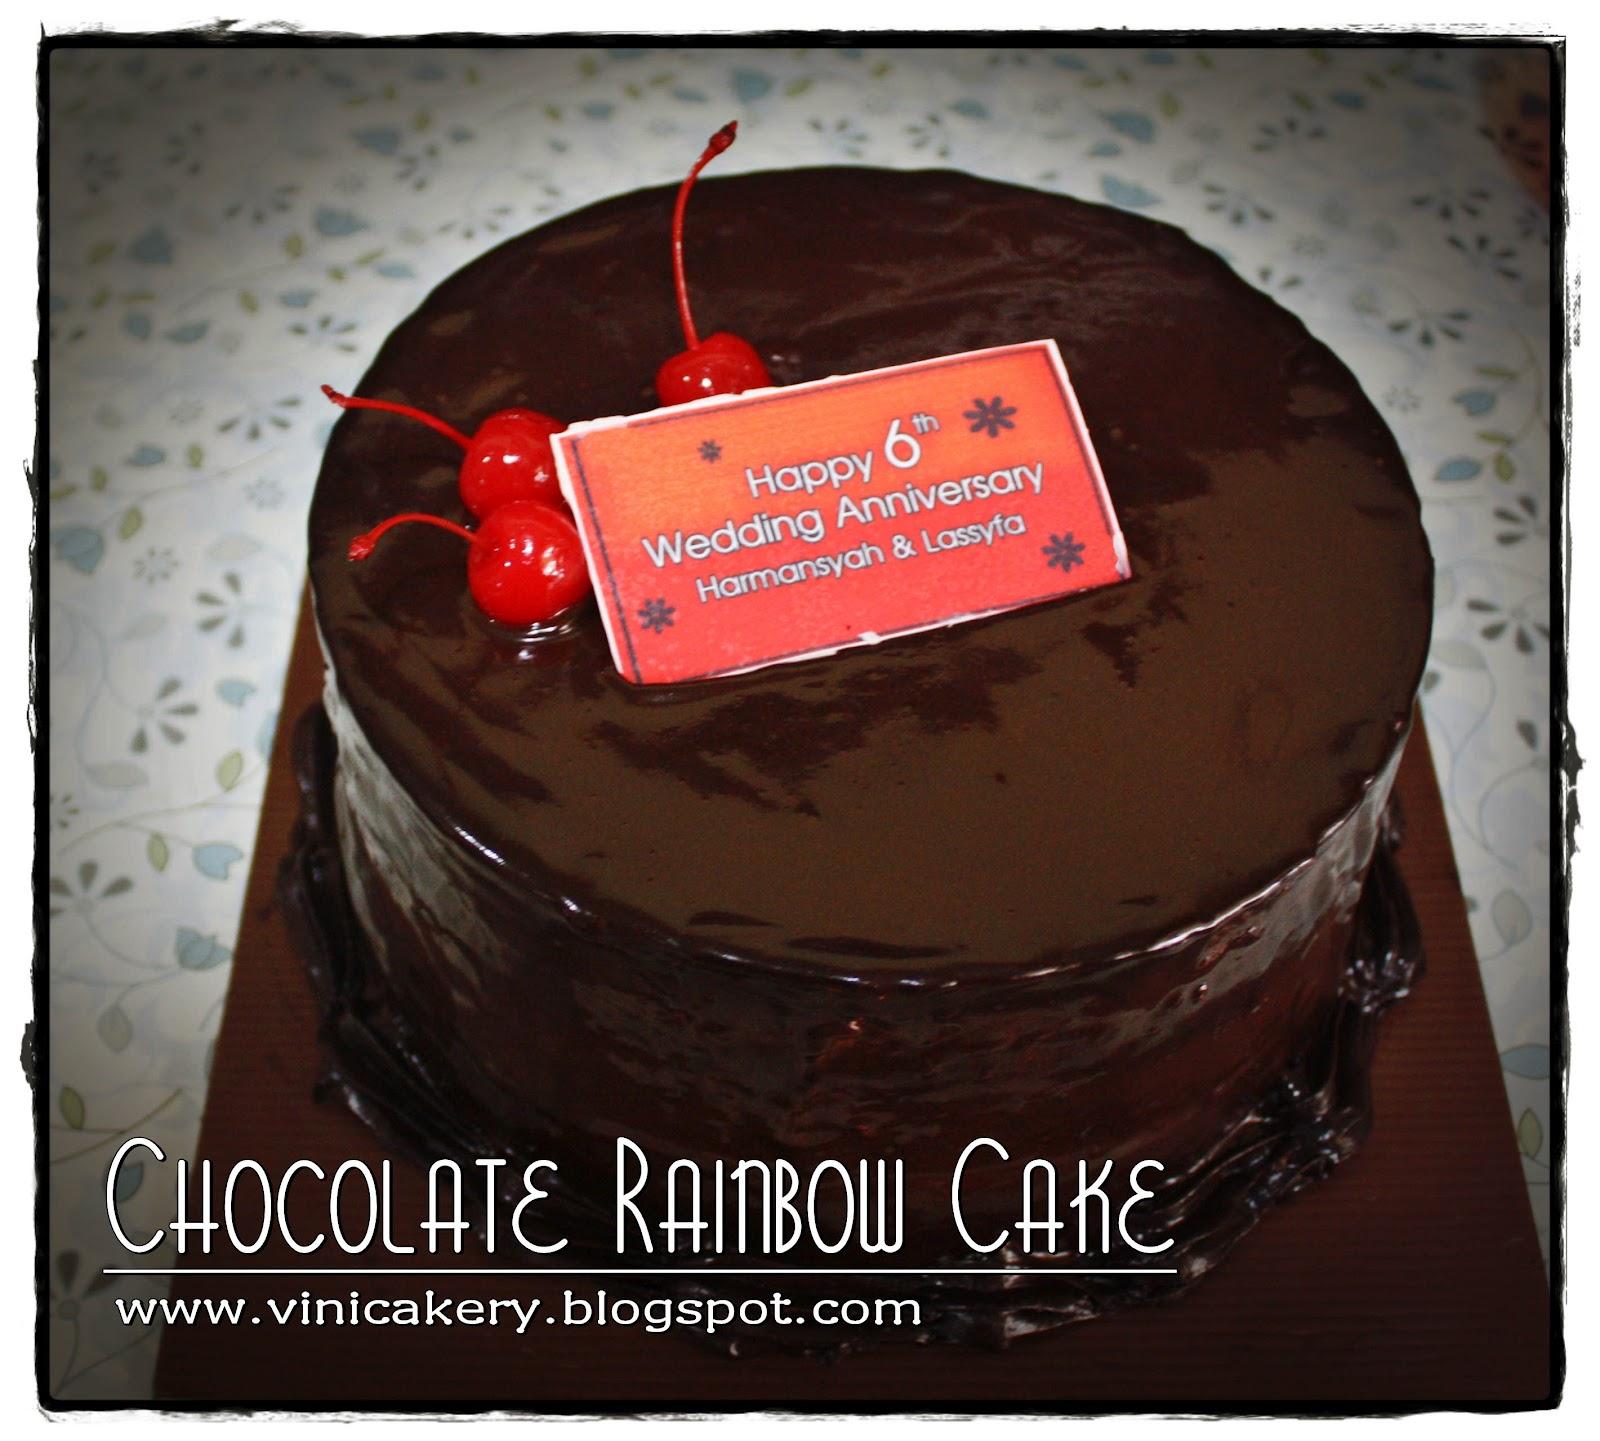 http://2.bp.blogspot.com/-pvYTn1LA_M0/T9cV_SqRduI/AAAAAAAABNs/phbrOi_rao0/s1600/Chocolate%20Rainbow%20Cake.jpg